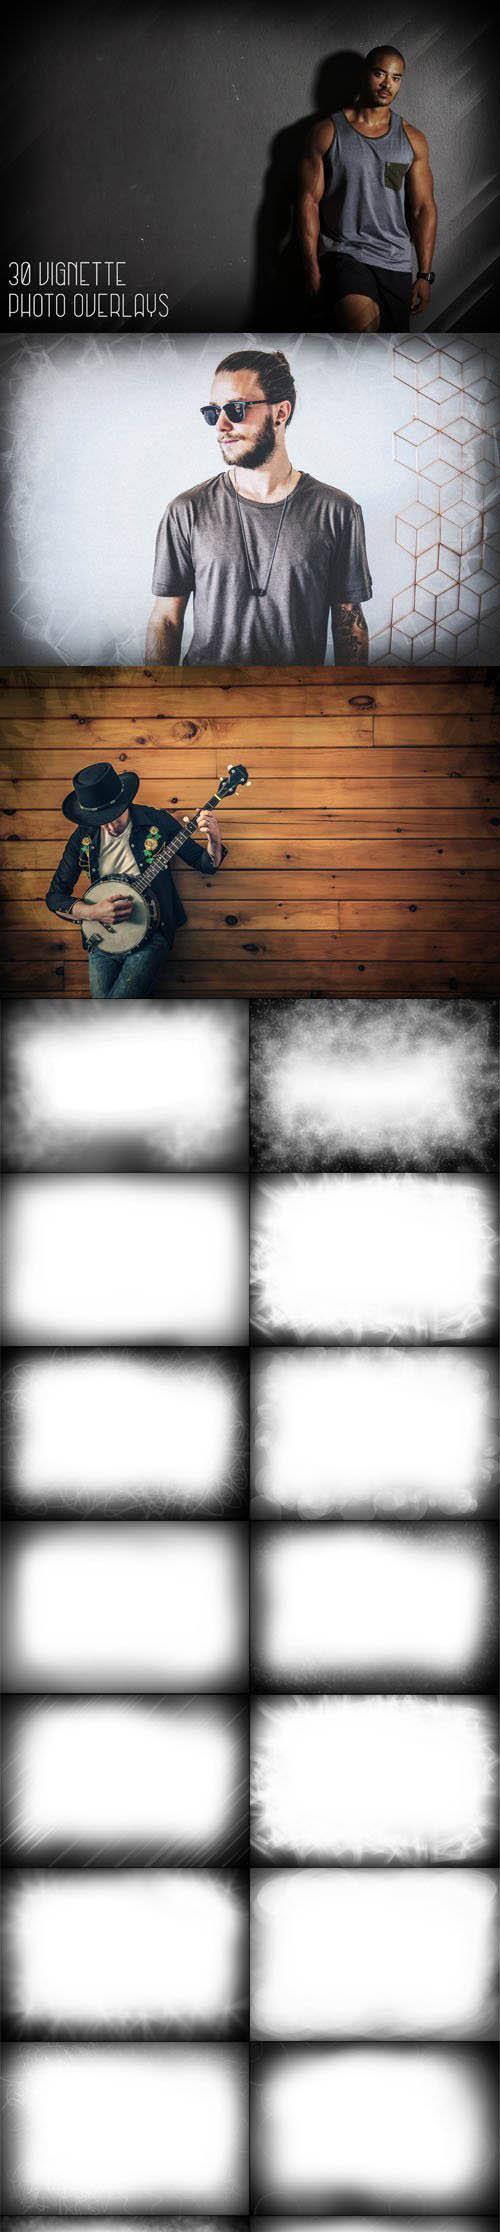 30 Vignette Photo Overlays